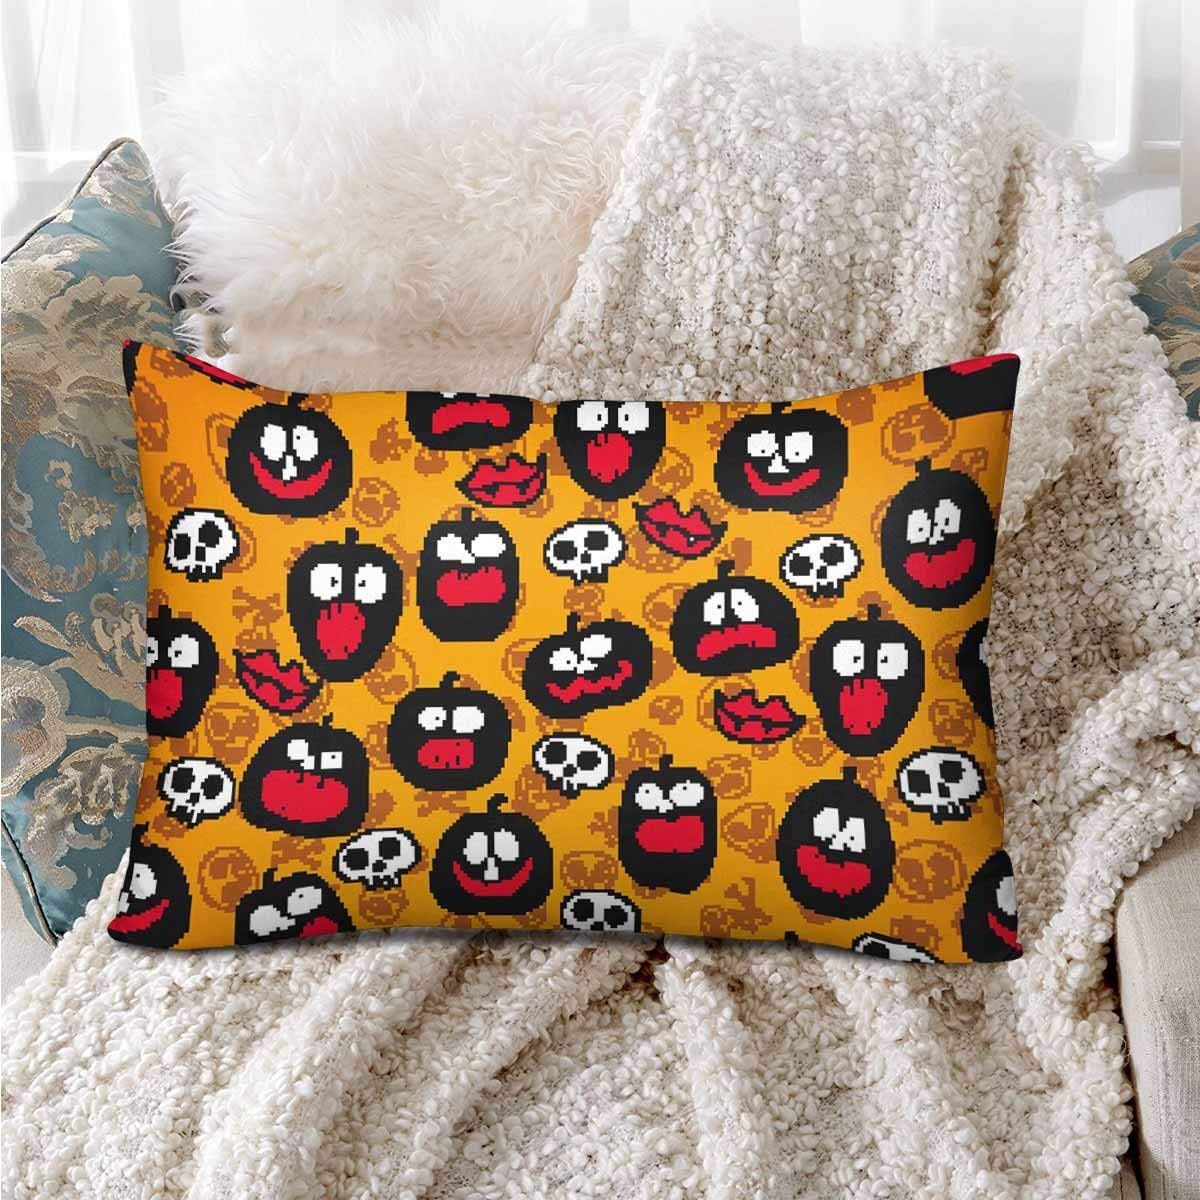 GCKG Halloween Seamless Bright Kids Doodle Pattern Pillow Cases Pillowcase 20x30 inches - image 1 de 4